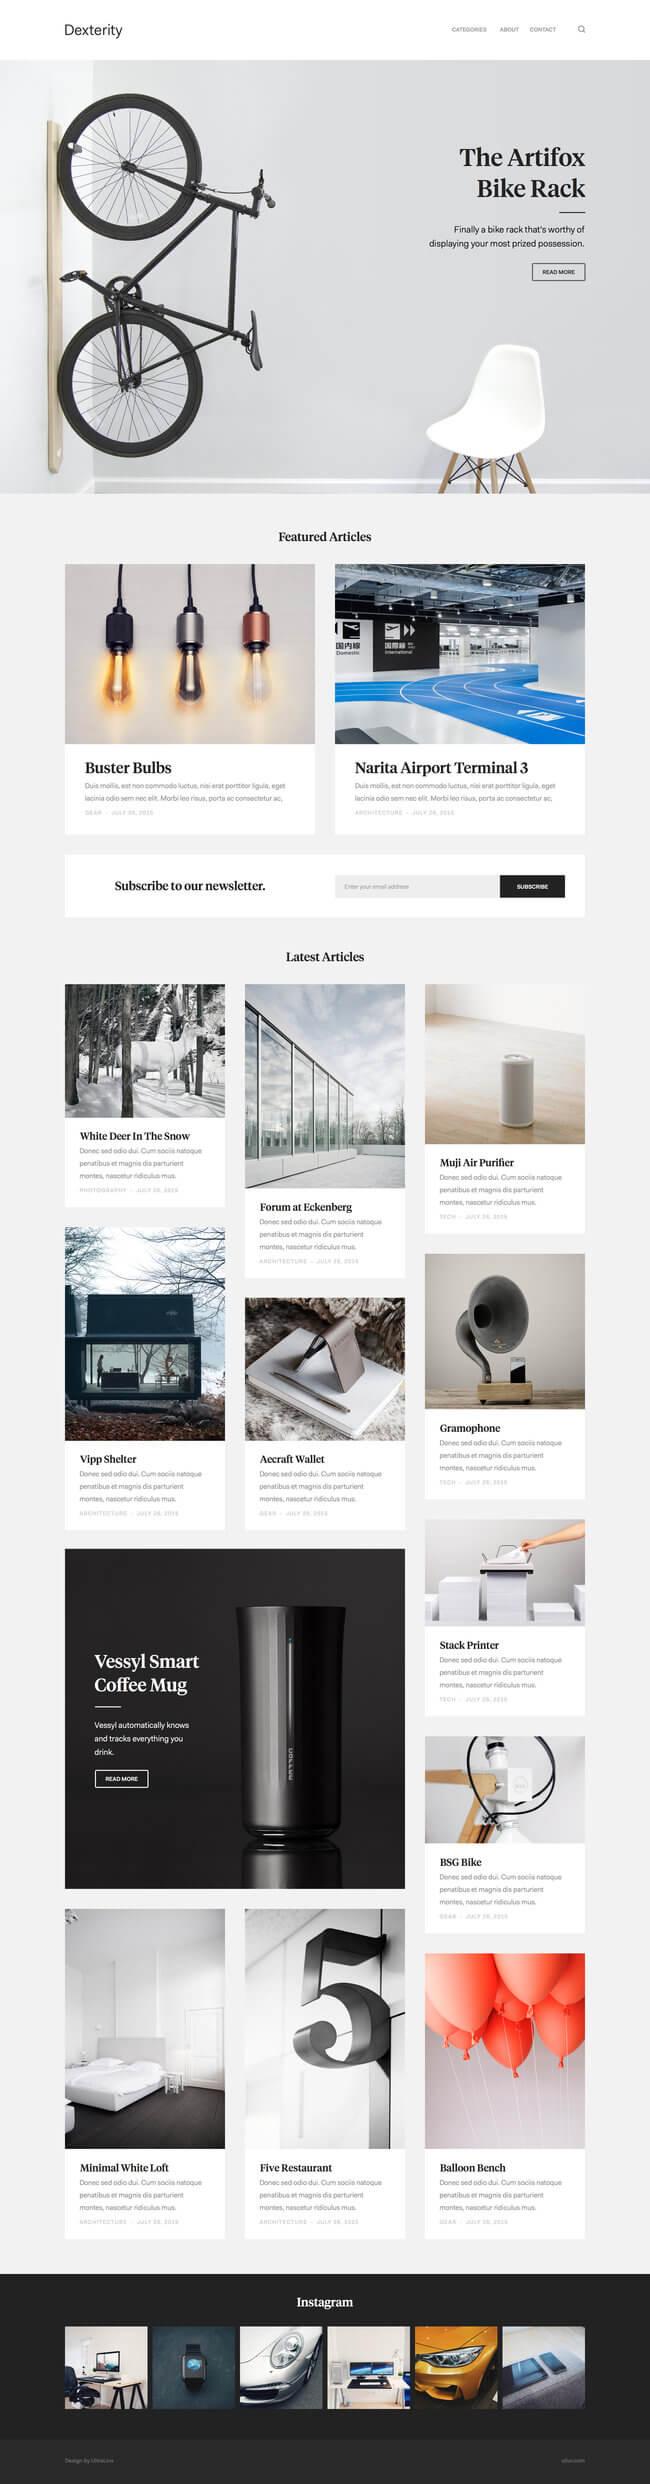 Dexterity Blog Magazine Layout by Oliur